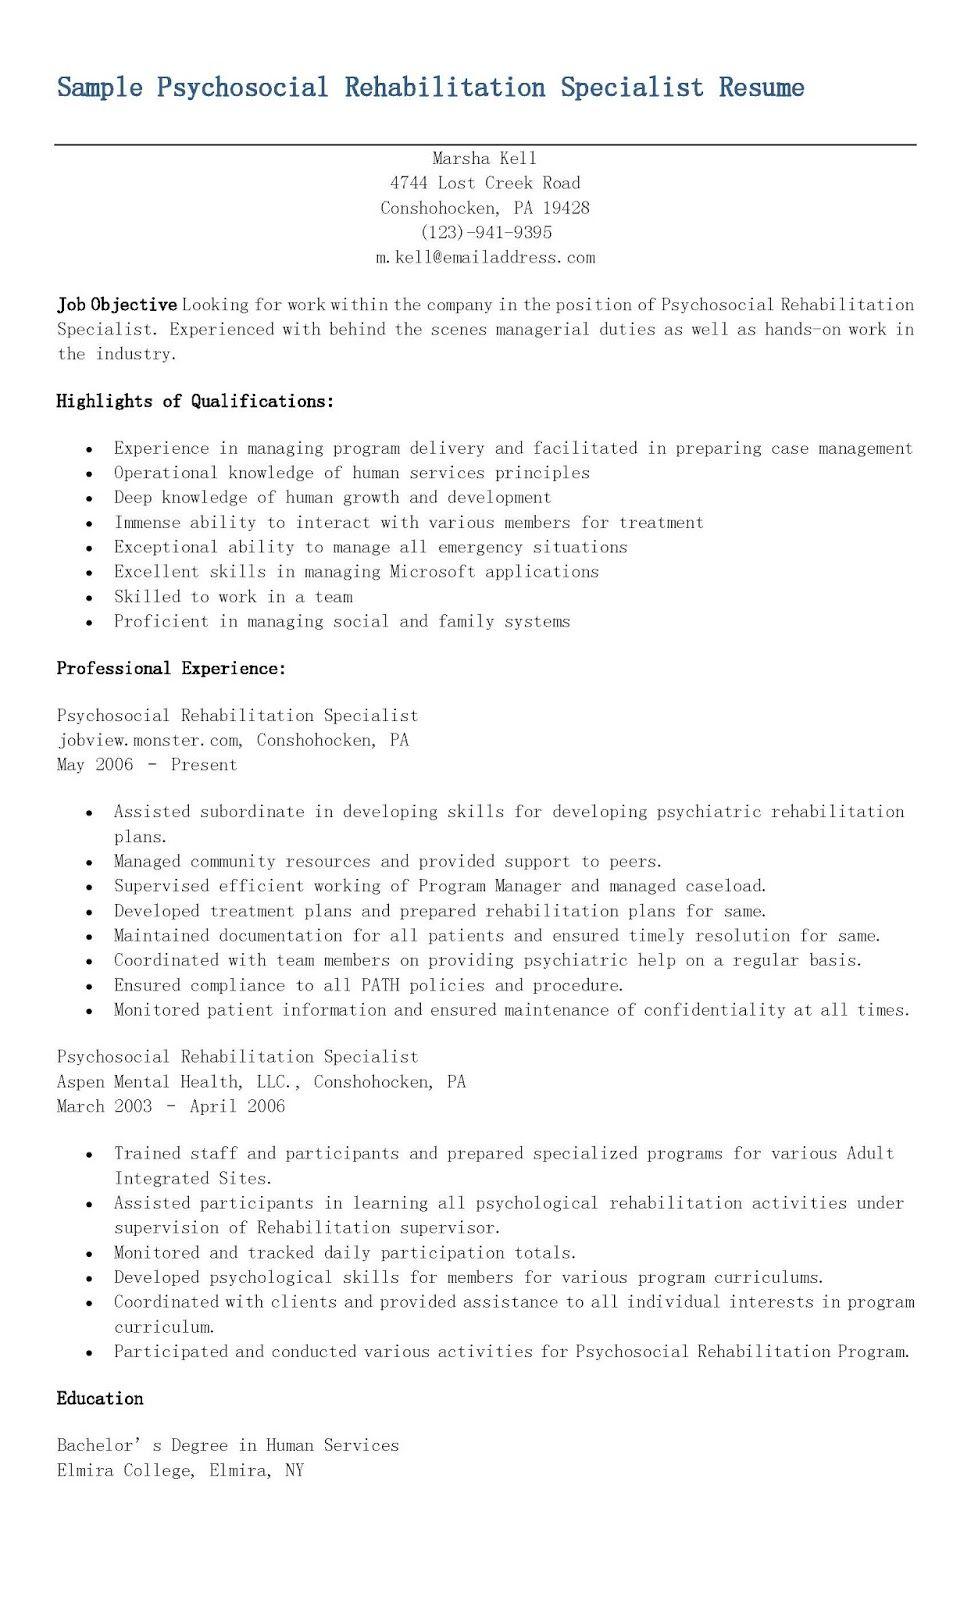 sample psychosocial rehabilitation specialist resume resame